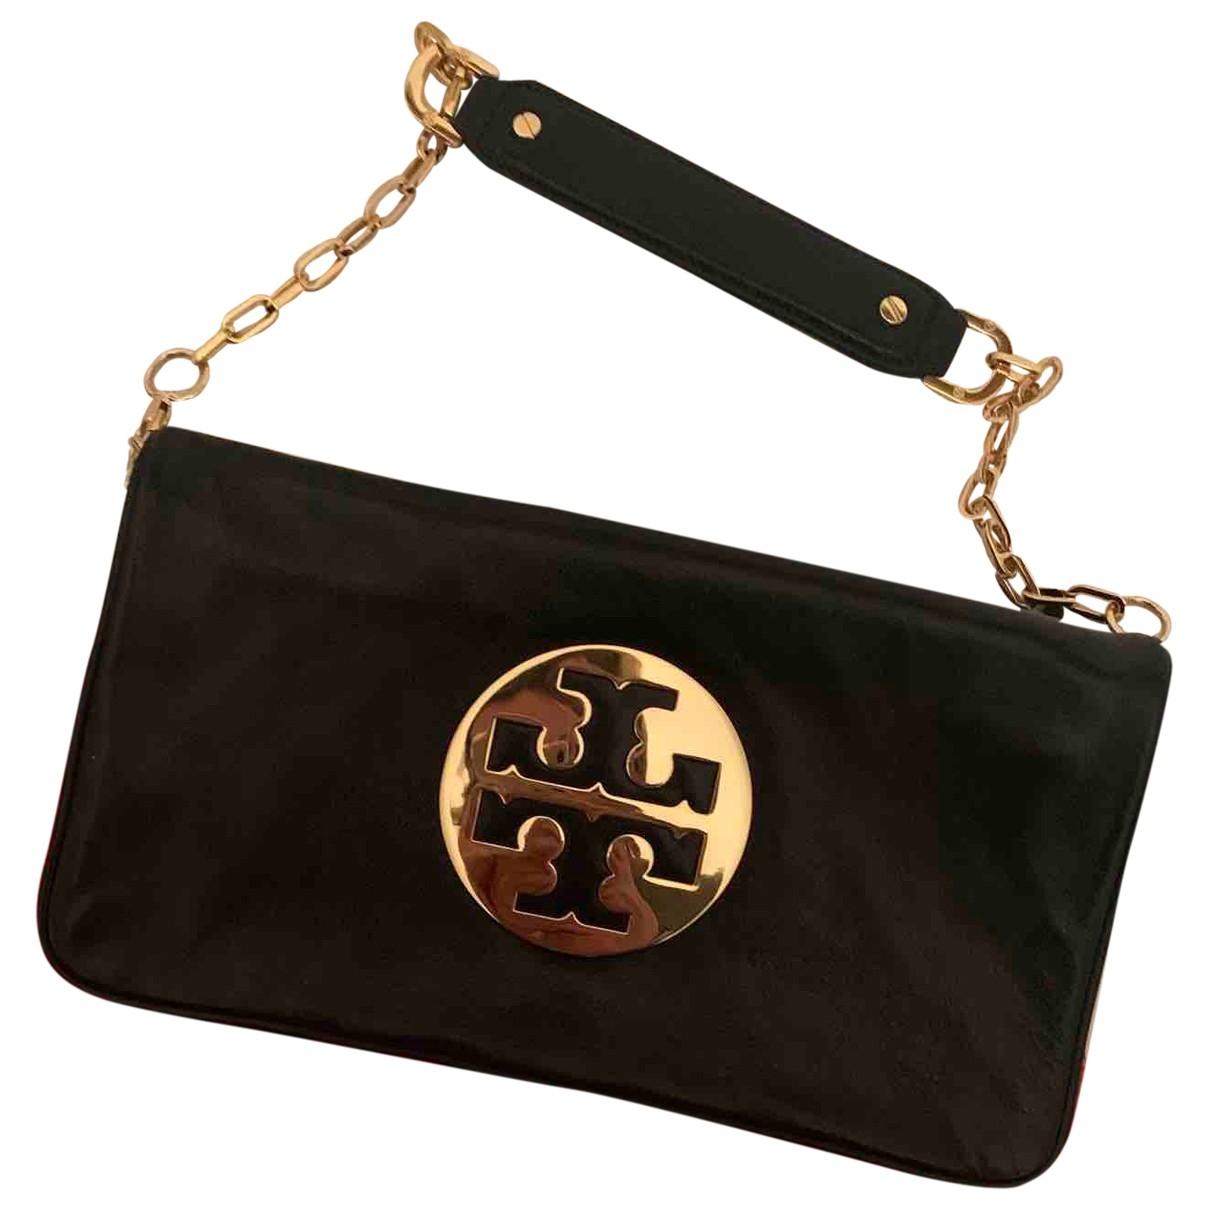 Tory Burch \N Black Leather Clutch bag for Women \N